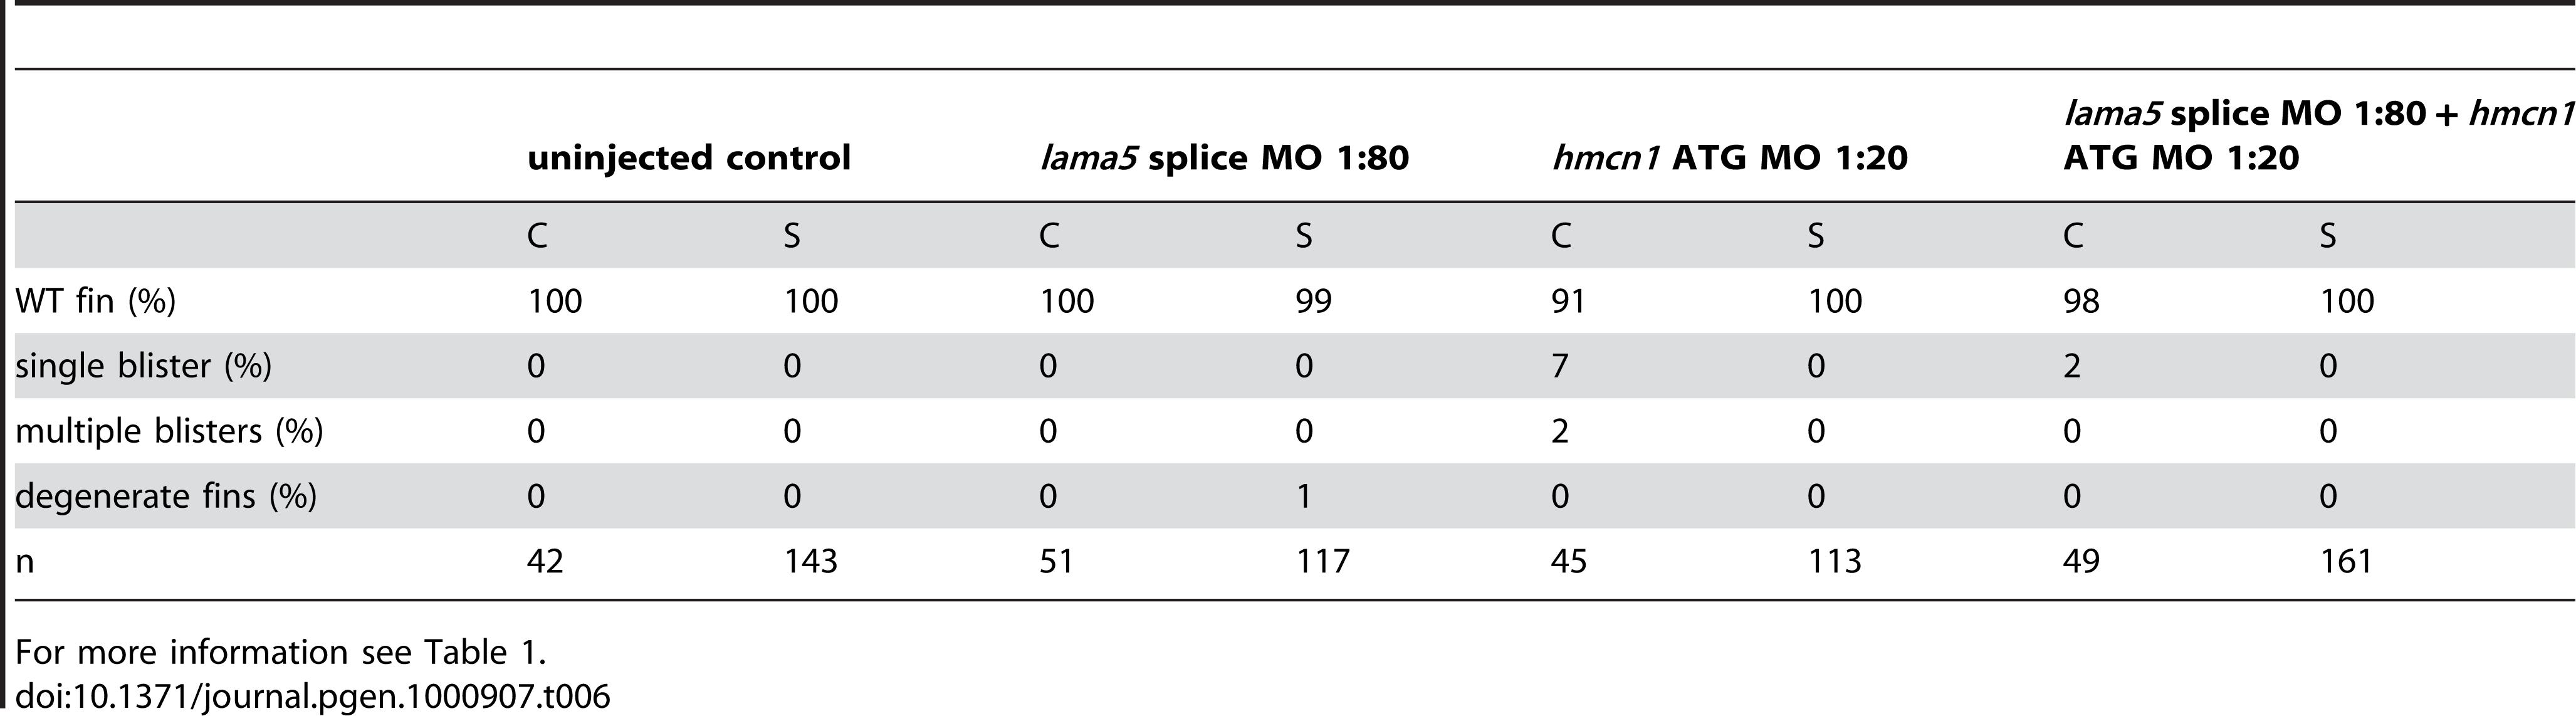 No synergistic interaction between <i>lama5</i> and <i>hmcn1</i>.